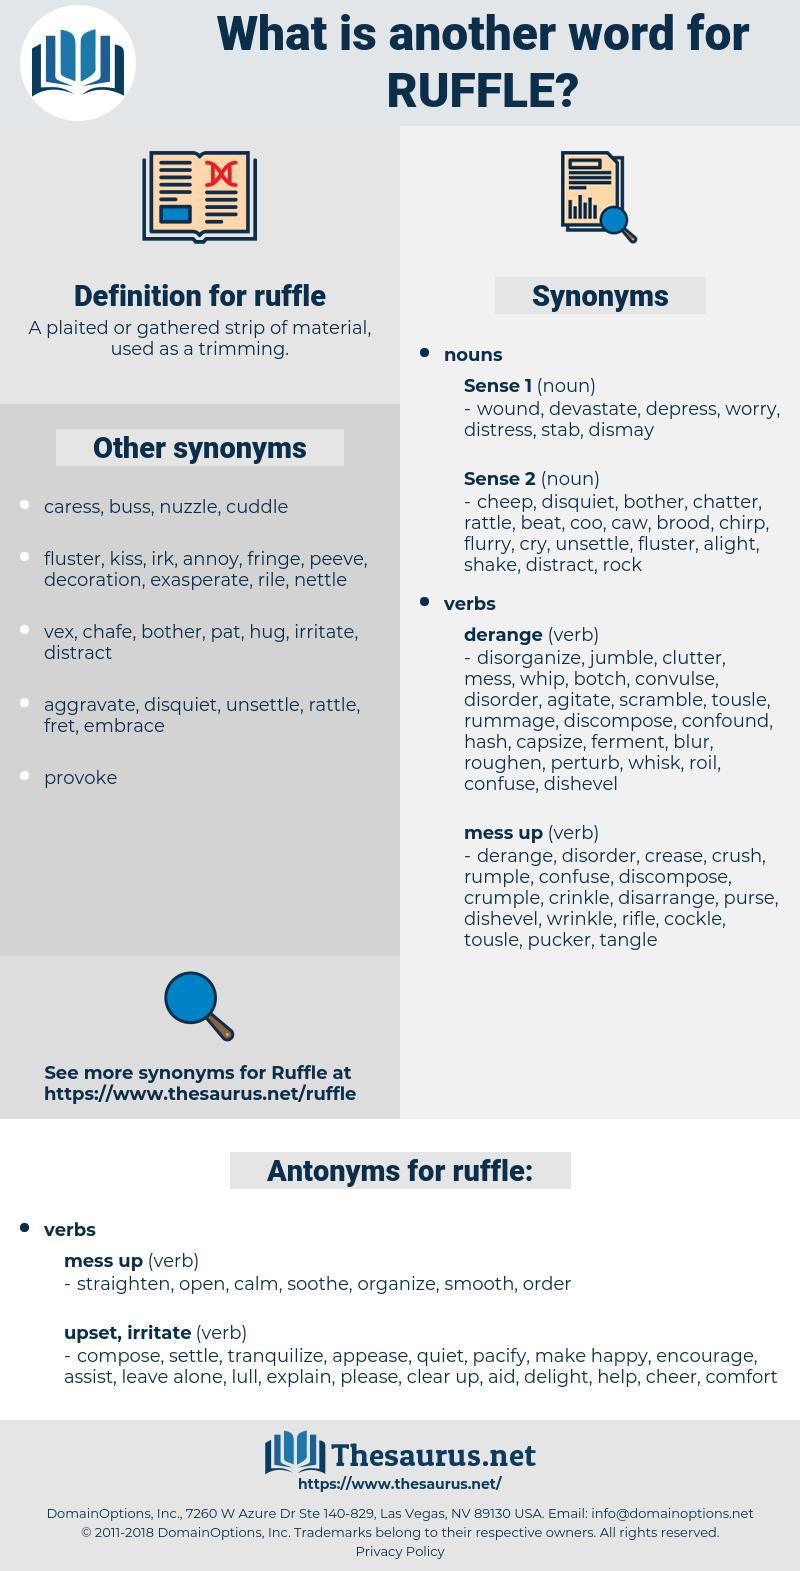 ruffle, synonym ruffle, another word for ruffle, words like ruffle, thesaurus ruffle